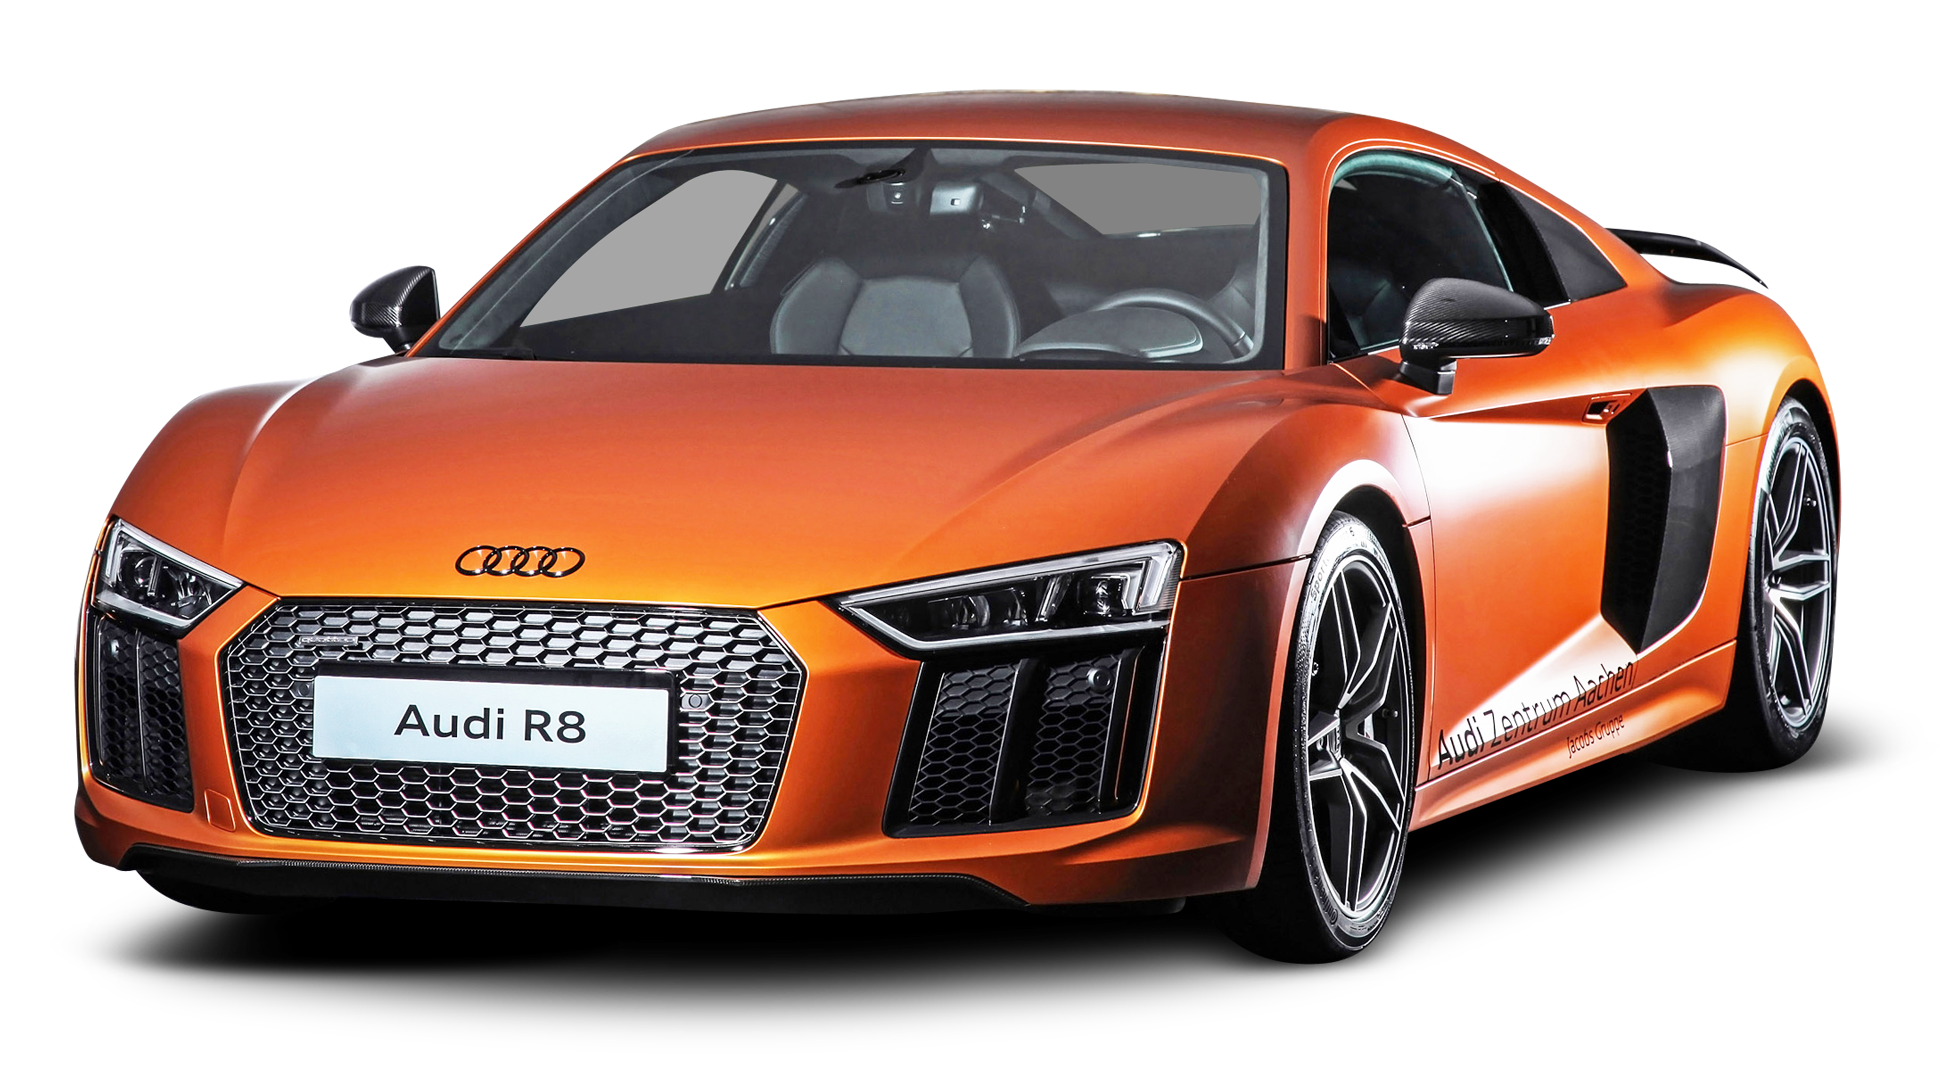 Audi car clipart clipart freeuse library Orange Audi R8 Car PNG Image - PurePNG   Free transparent CC0 PNG ... clipart freeuse library